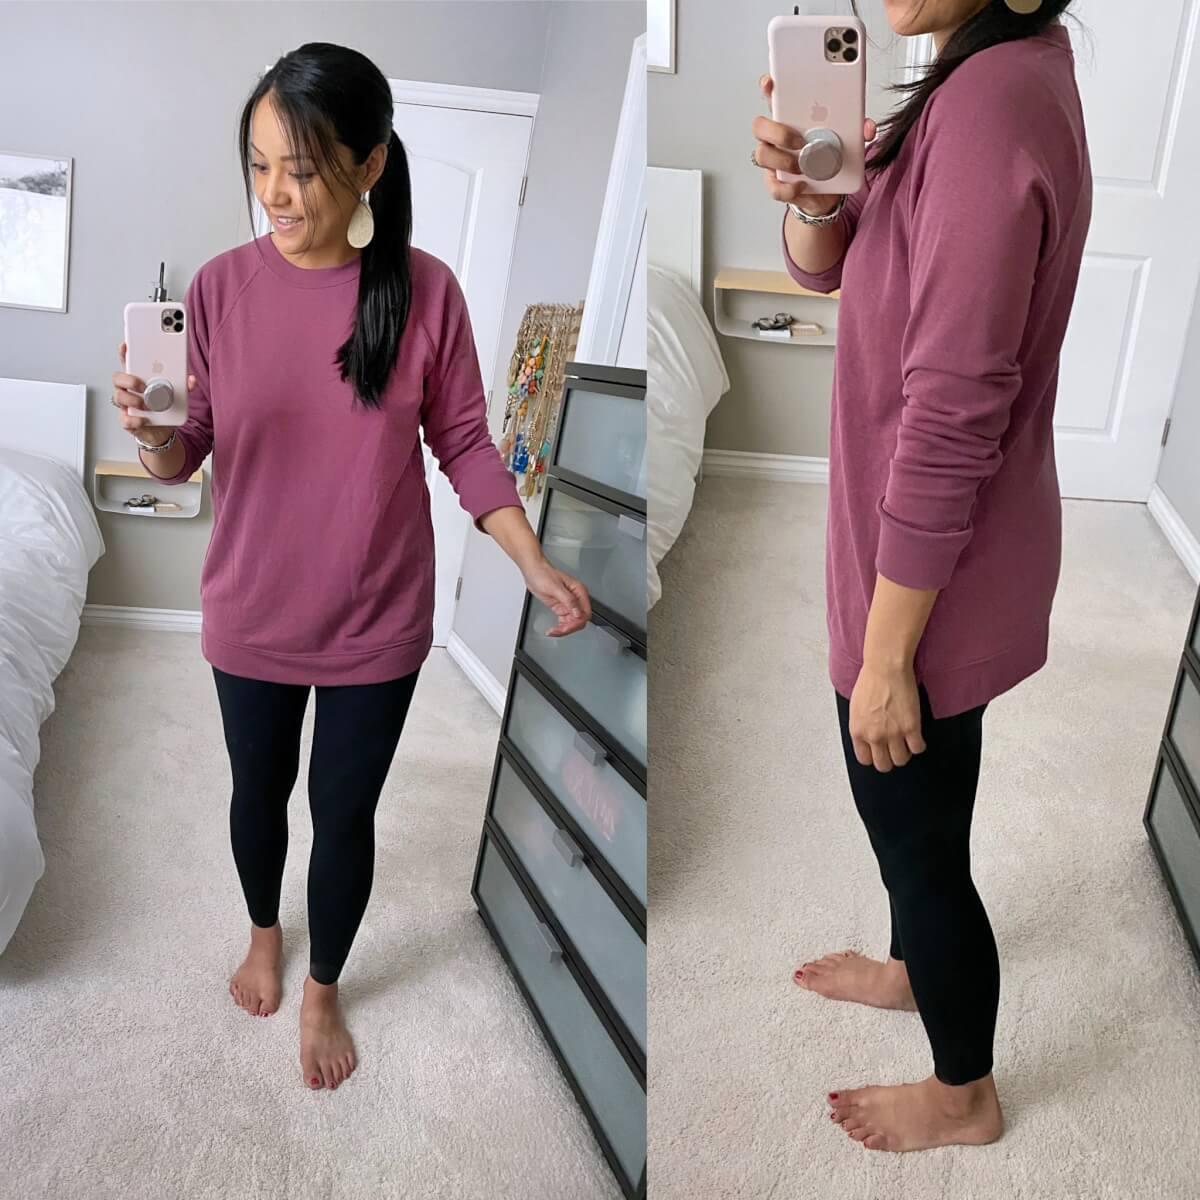 Casual Leggings Outfit: pink tunic sweatshirt + black leggings + metallic leather earrings